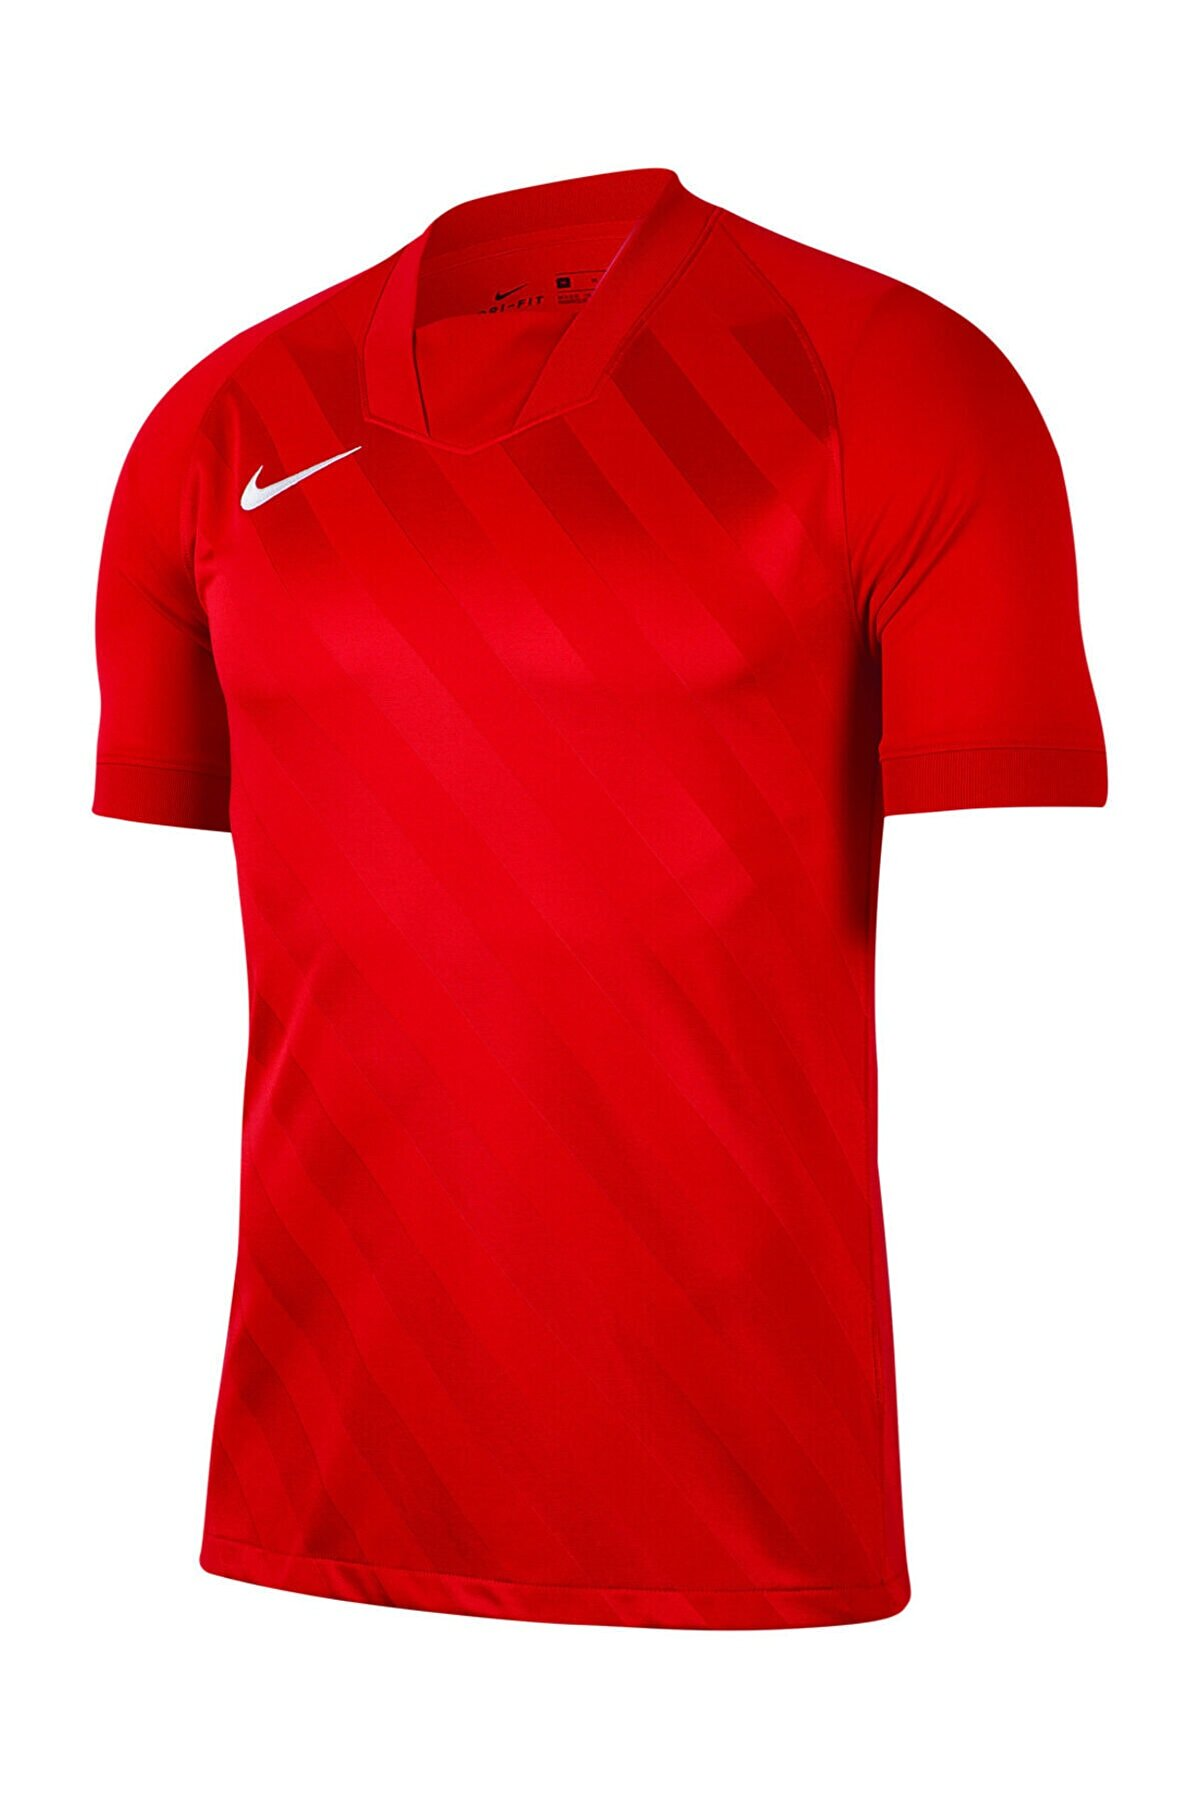 Nike Erkek Spor T-Shirt - Challenge III Jersey - BV6738-657